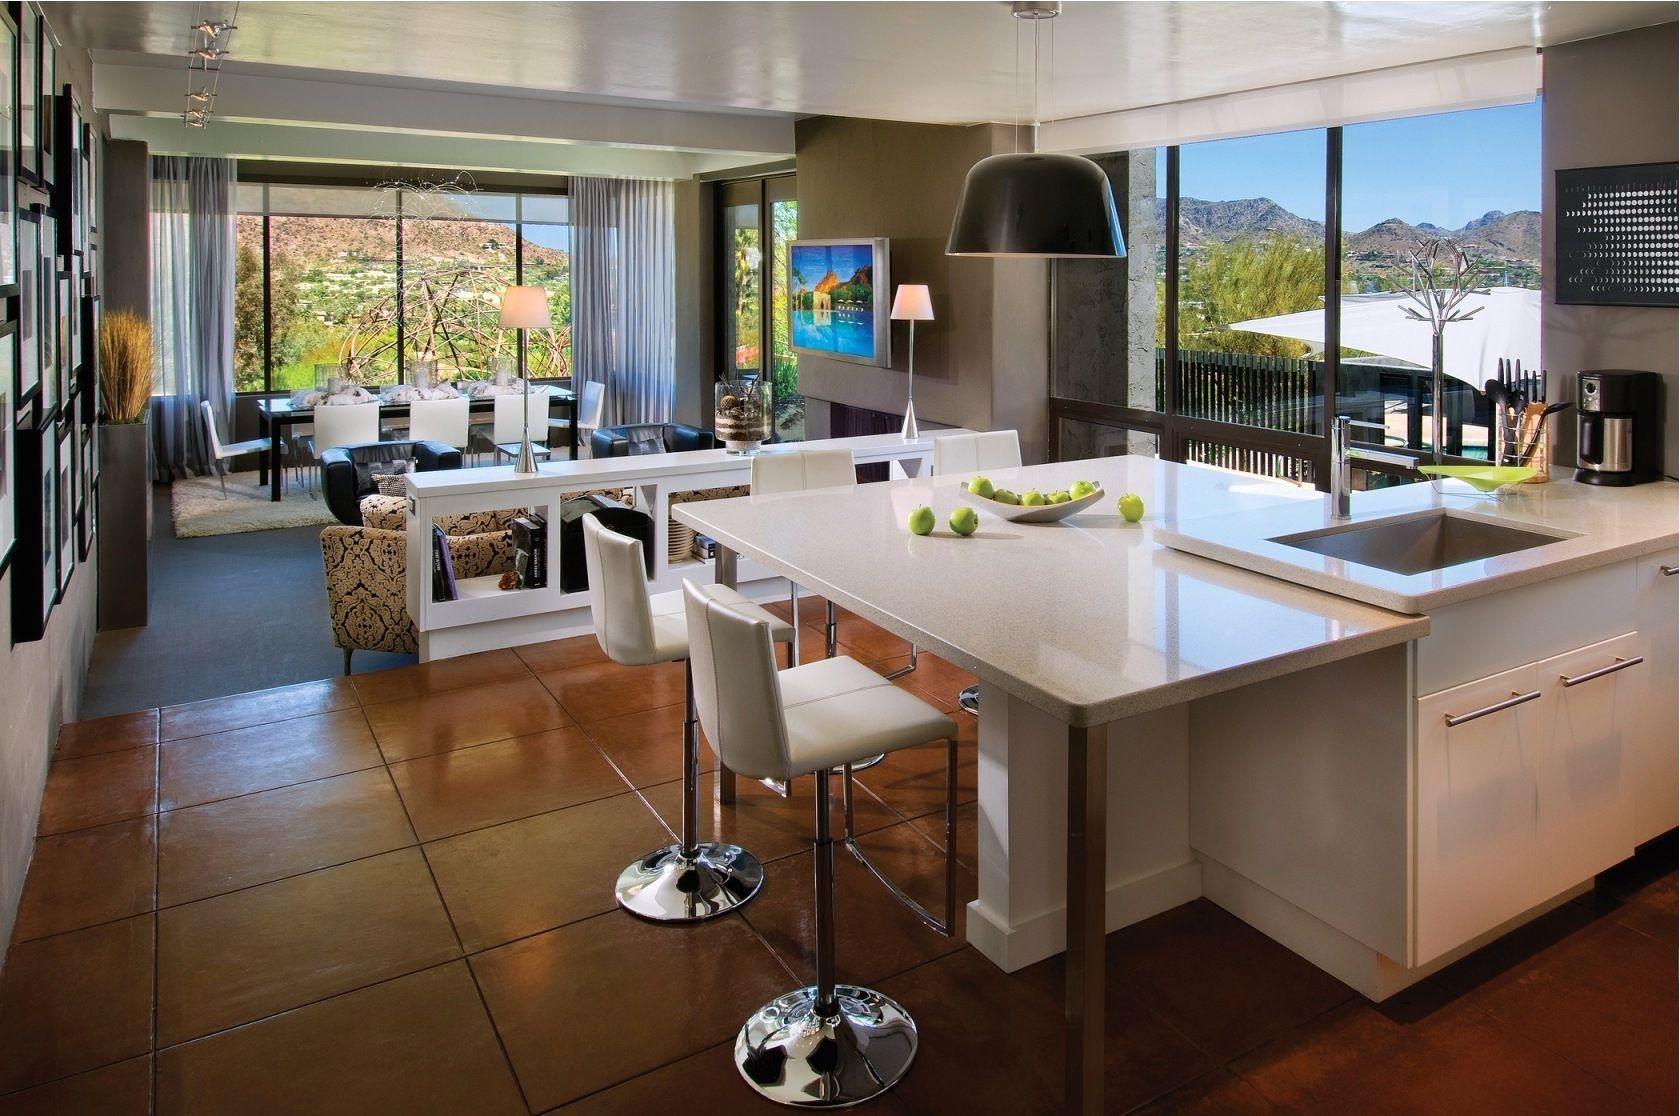 Kitchen Dining Room Living Room Open Floor Plan Interior Open Floor Plan Kitchen Dining Living Room Ceramic